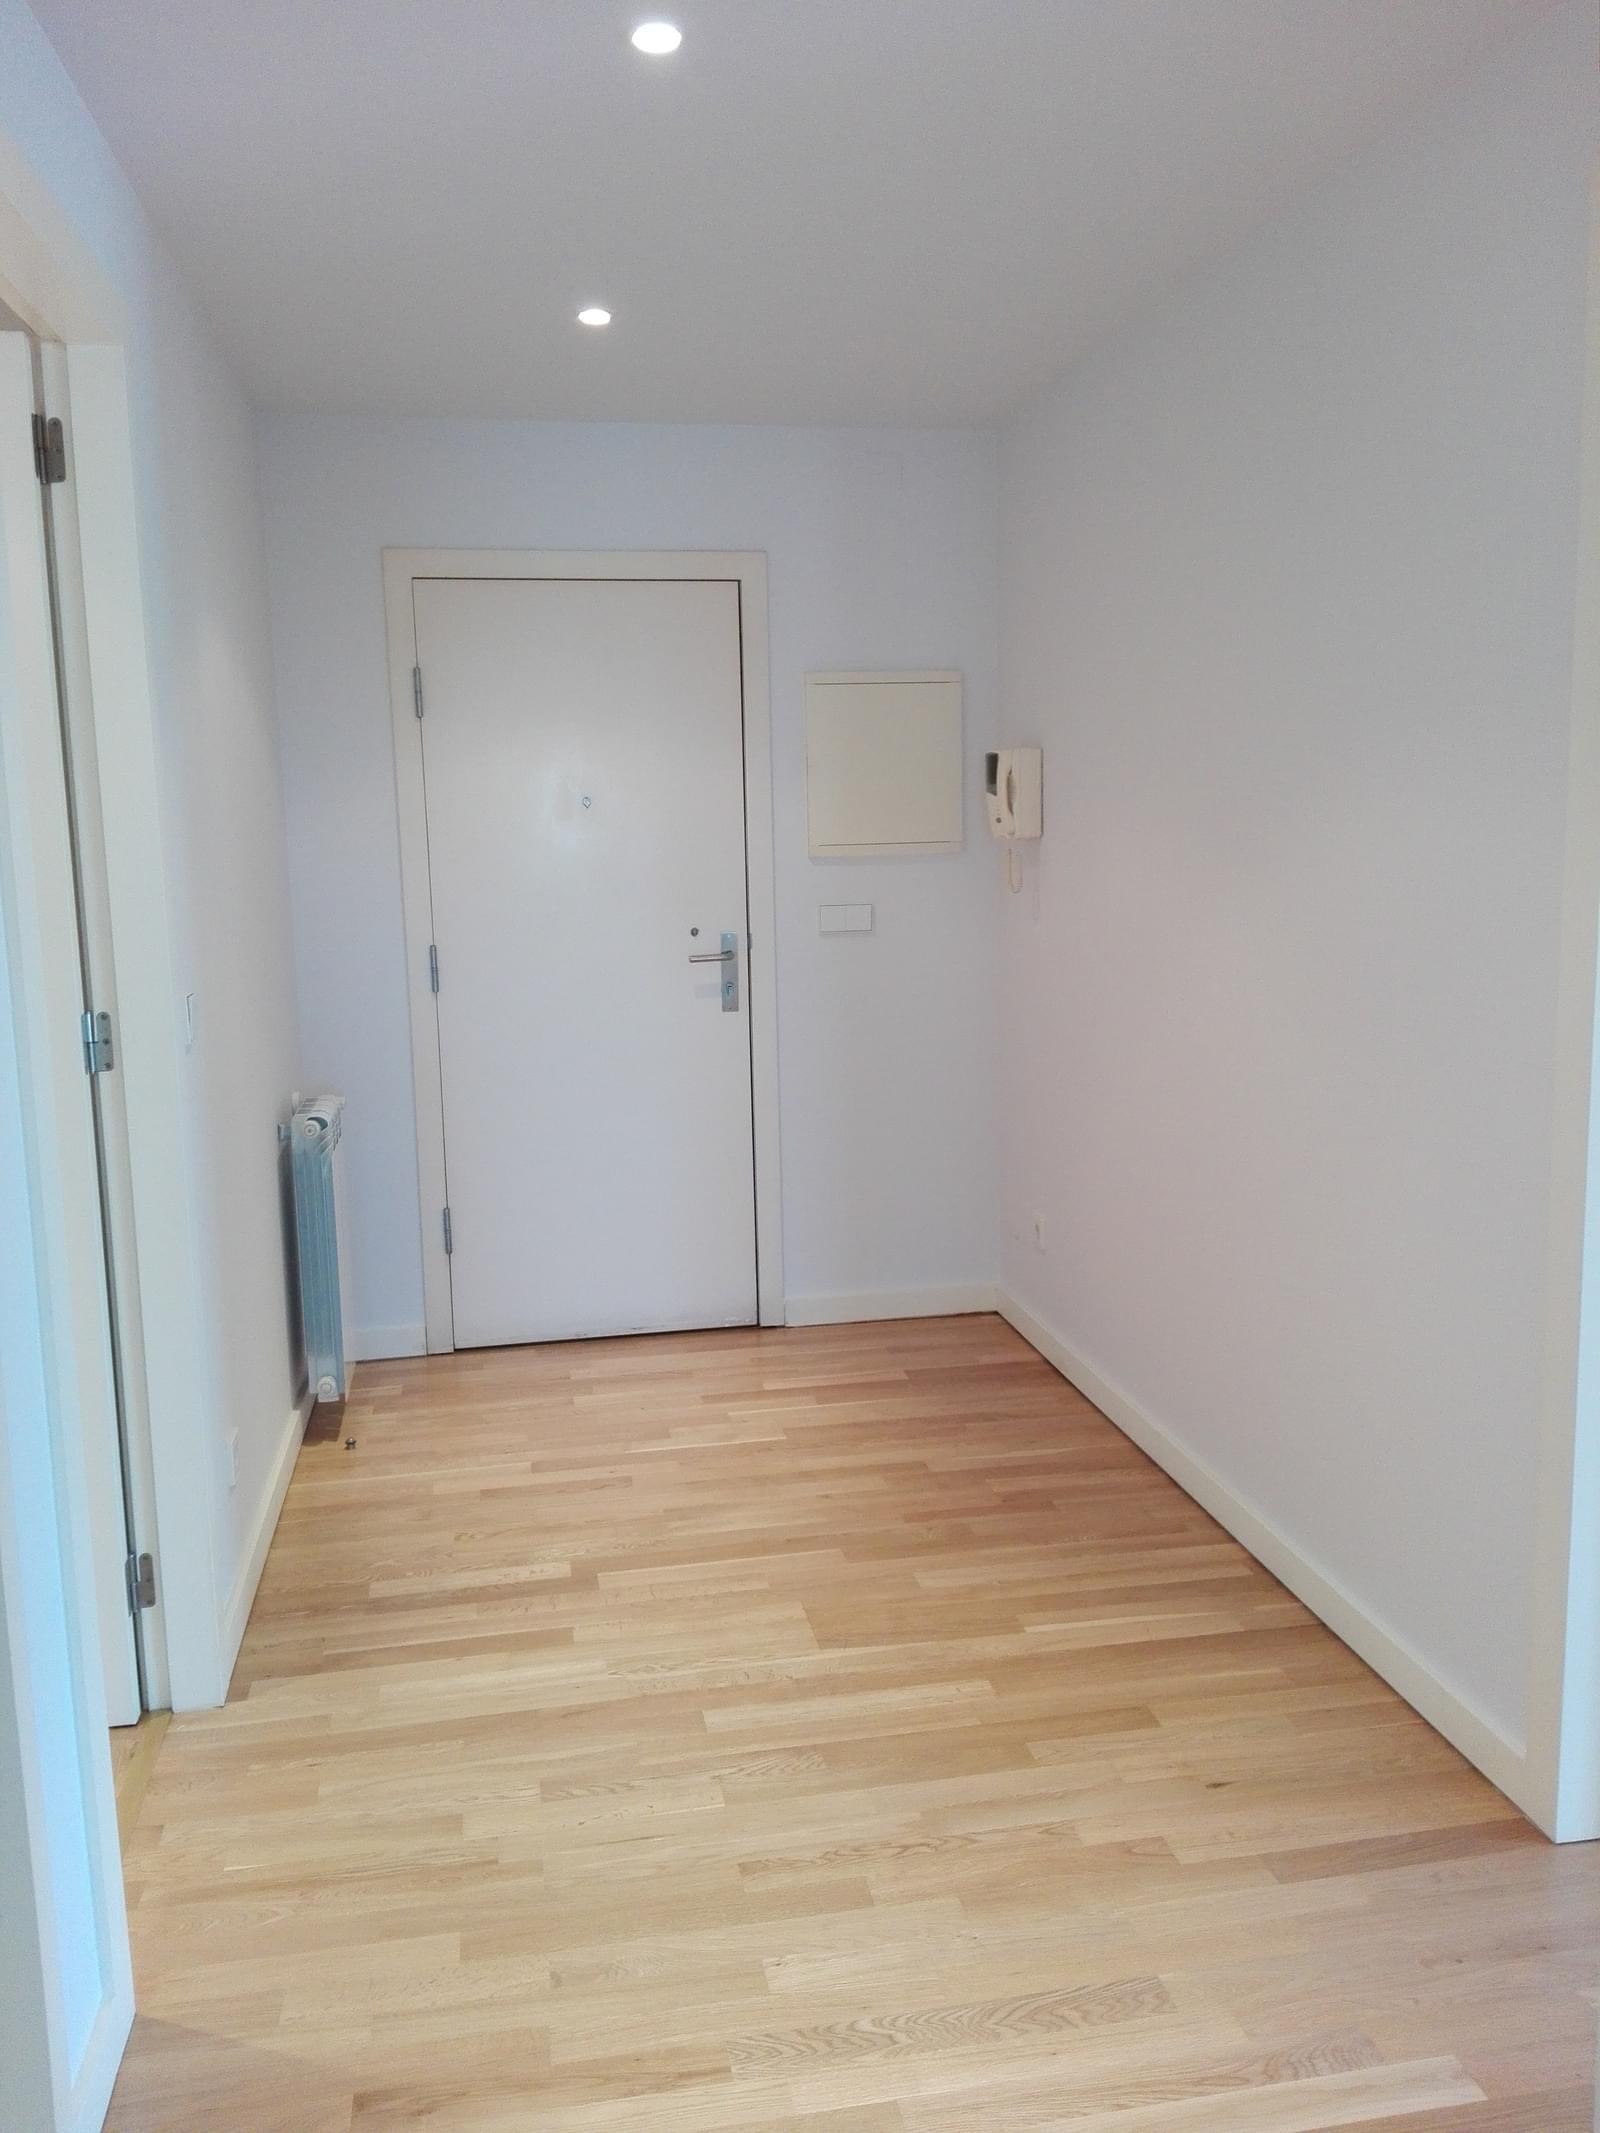 pf18814-apartamento-t2-lisboa-9c86bfad-a8ea-4388-b91c-df1b4ebe1bbe